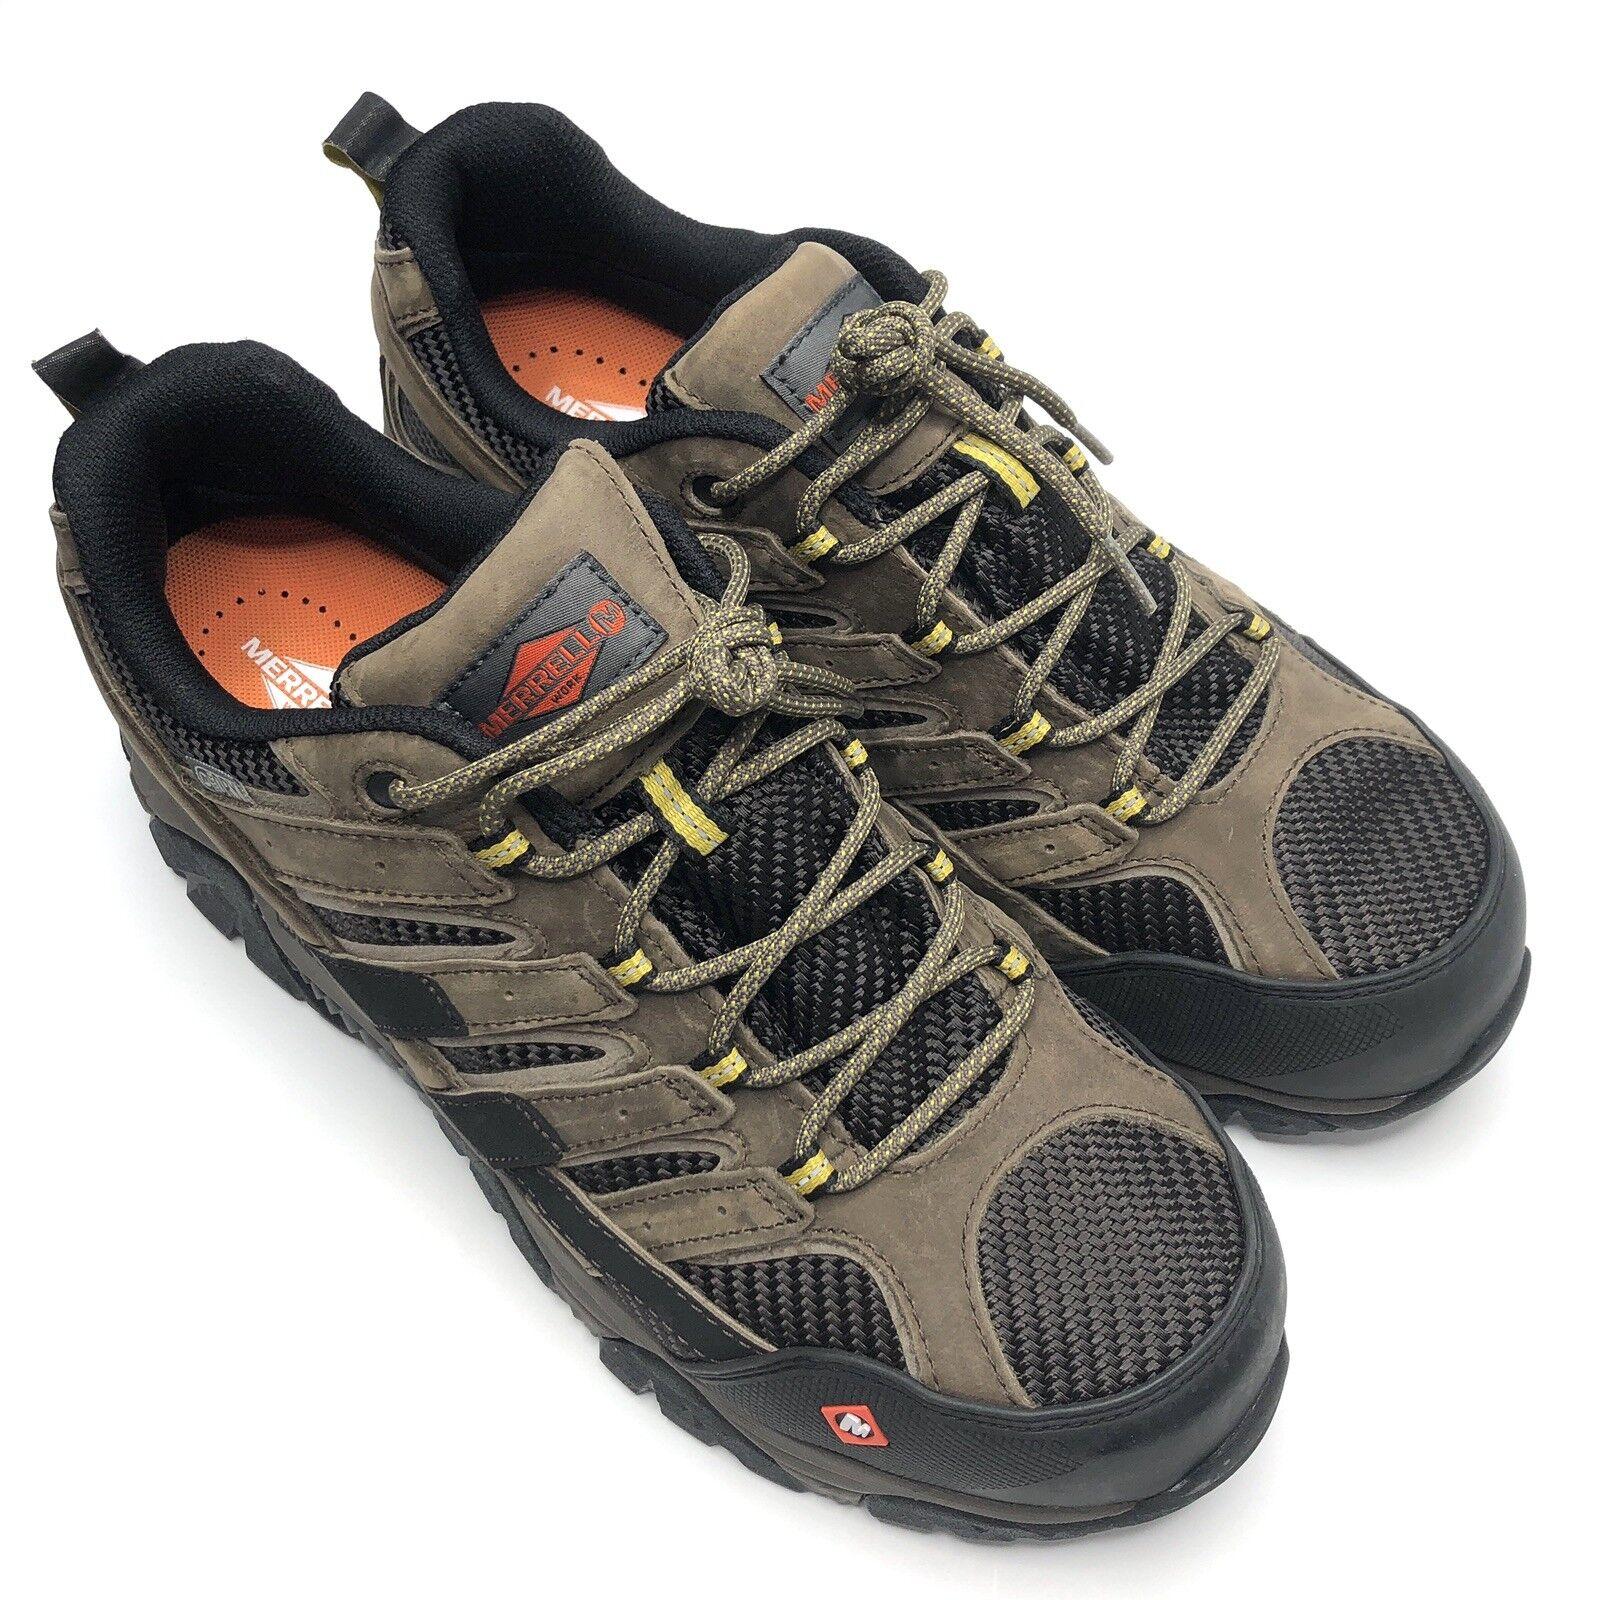 Merrell Hommes Moab 2 Vent Imperméable composite Toe Travail Chaussure J15773 Taille  12